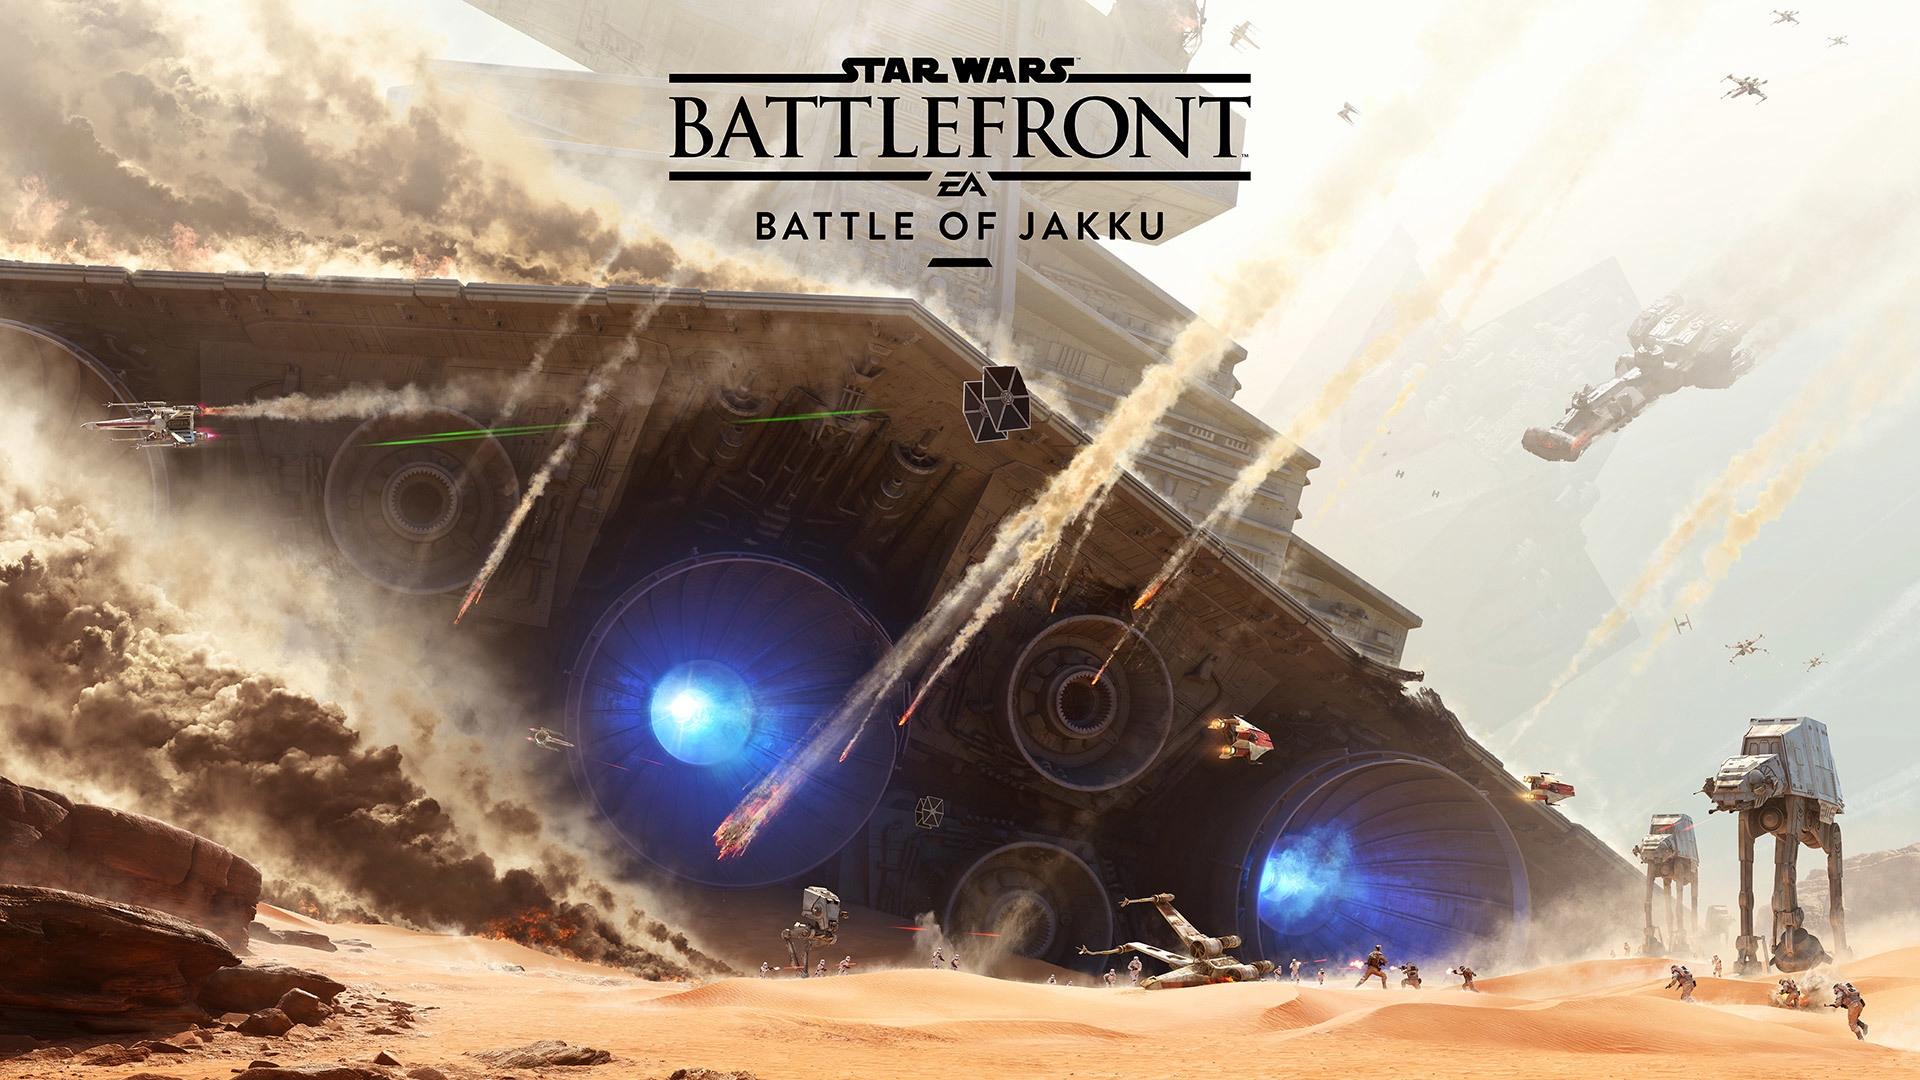 Download wallpaper 1920x1080 star wars battlefront battle of 1920x1080